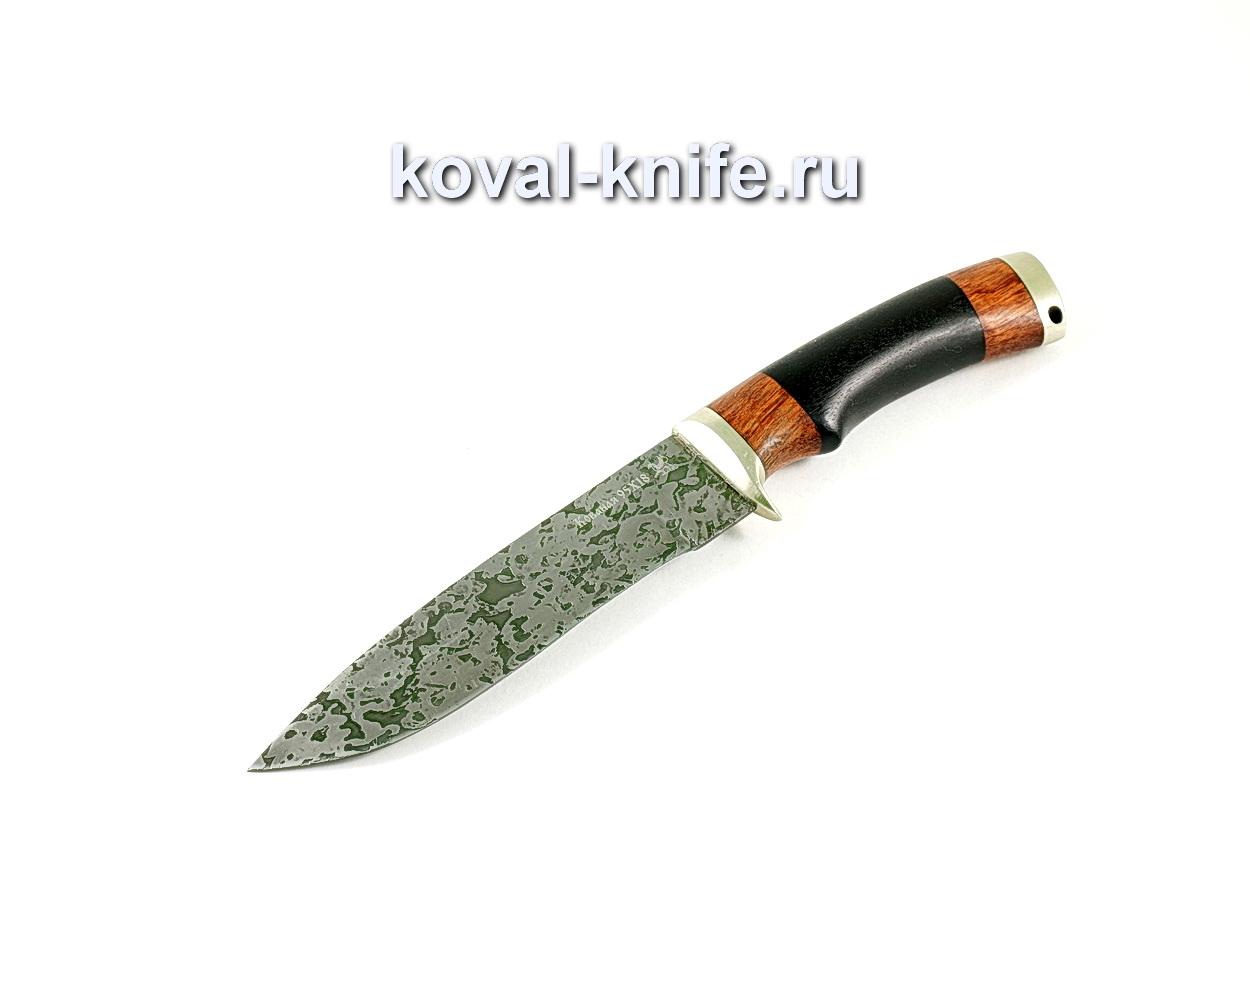 Нож Олимп (сталь 95х18), рукоять бубинга, граб, литье A240